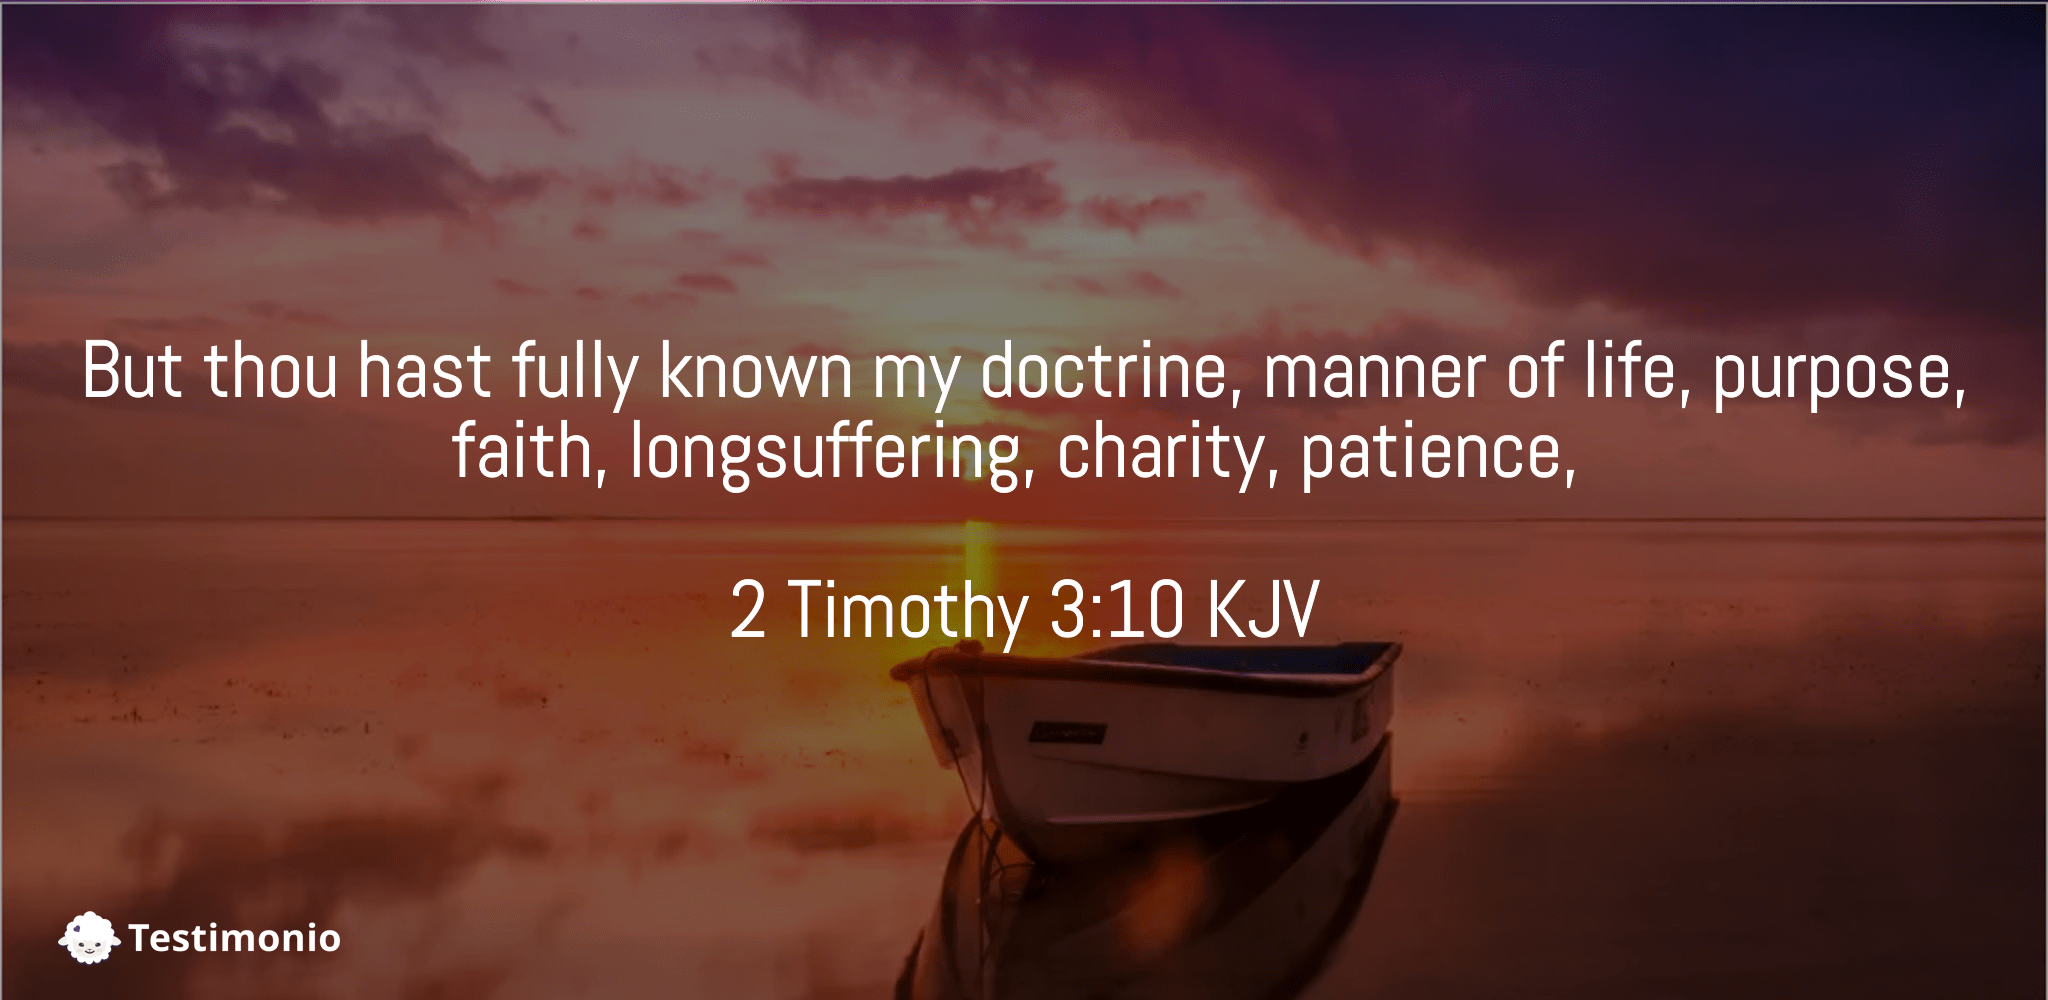 2 Timothy 3:10